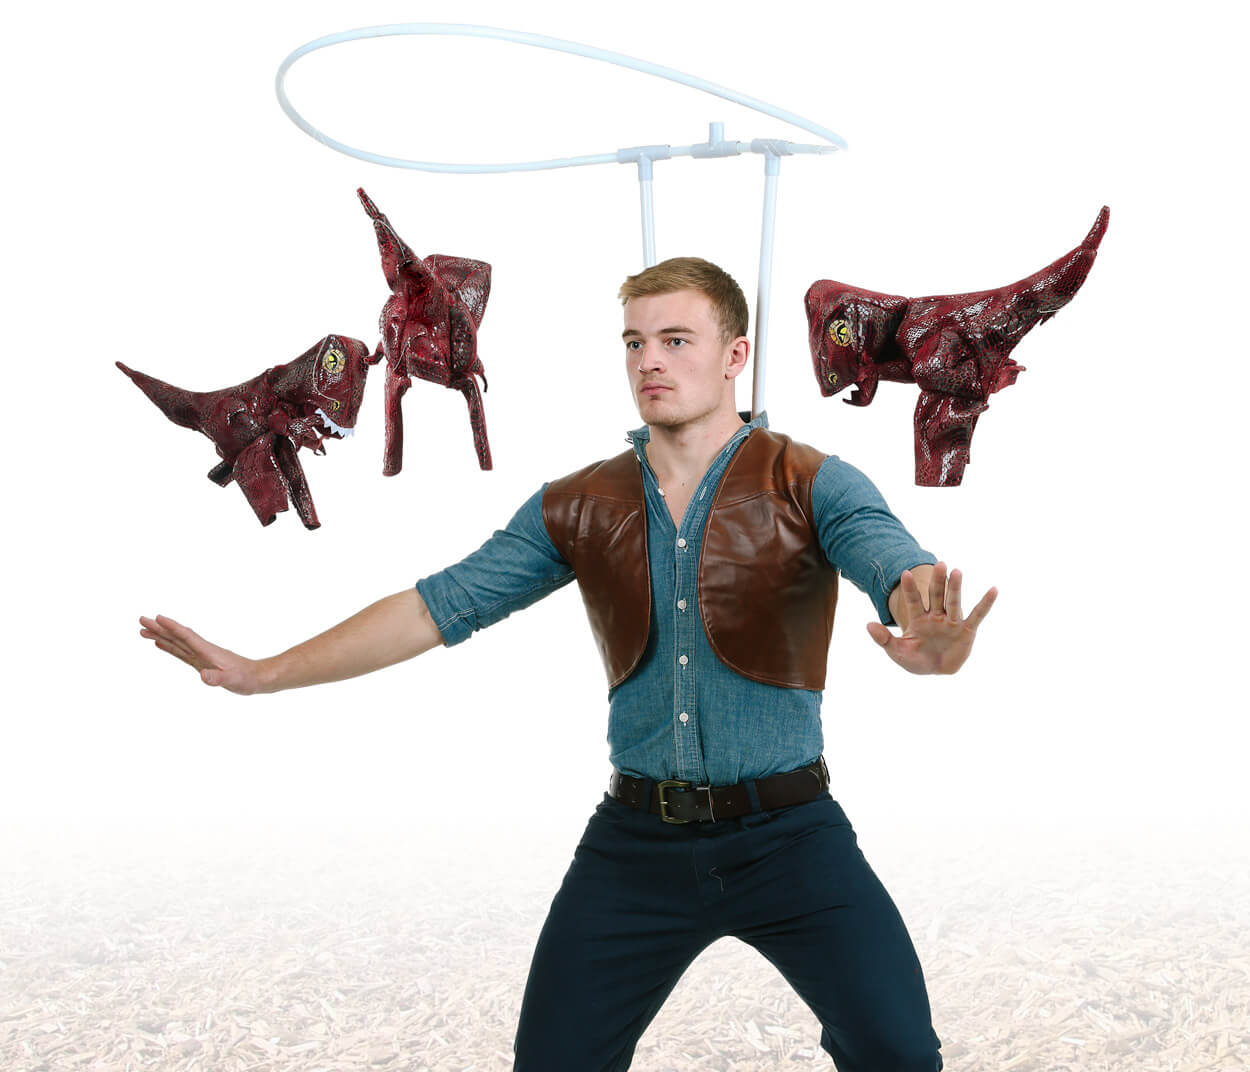 Owen Grady from Jurassic World cosplay